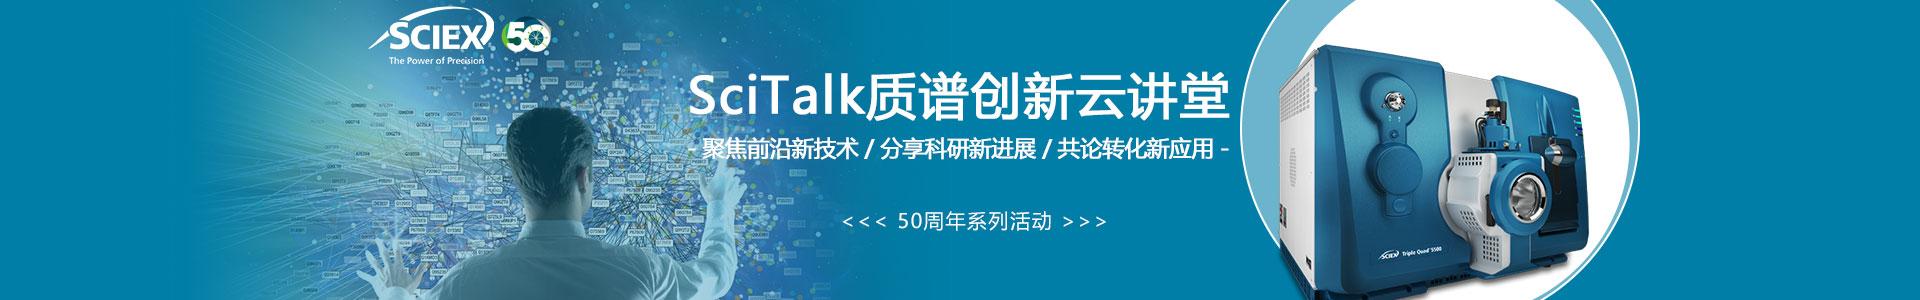 SciTalk质谱创新云讲堂